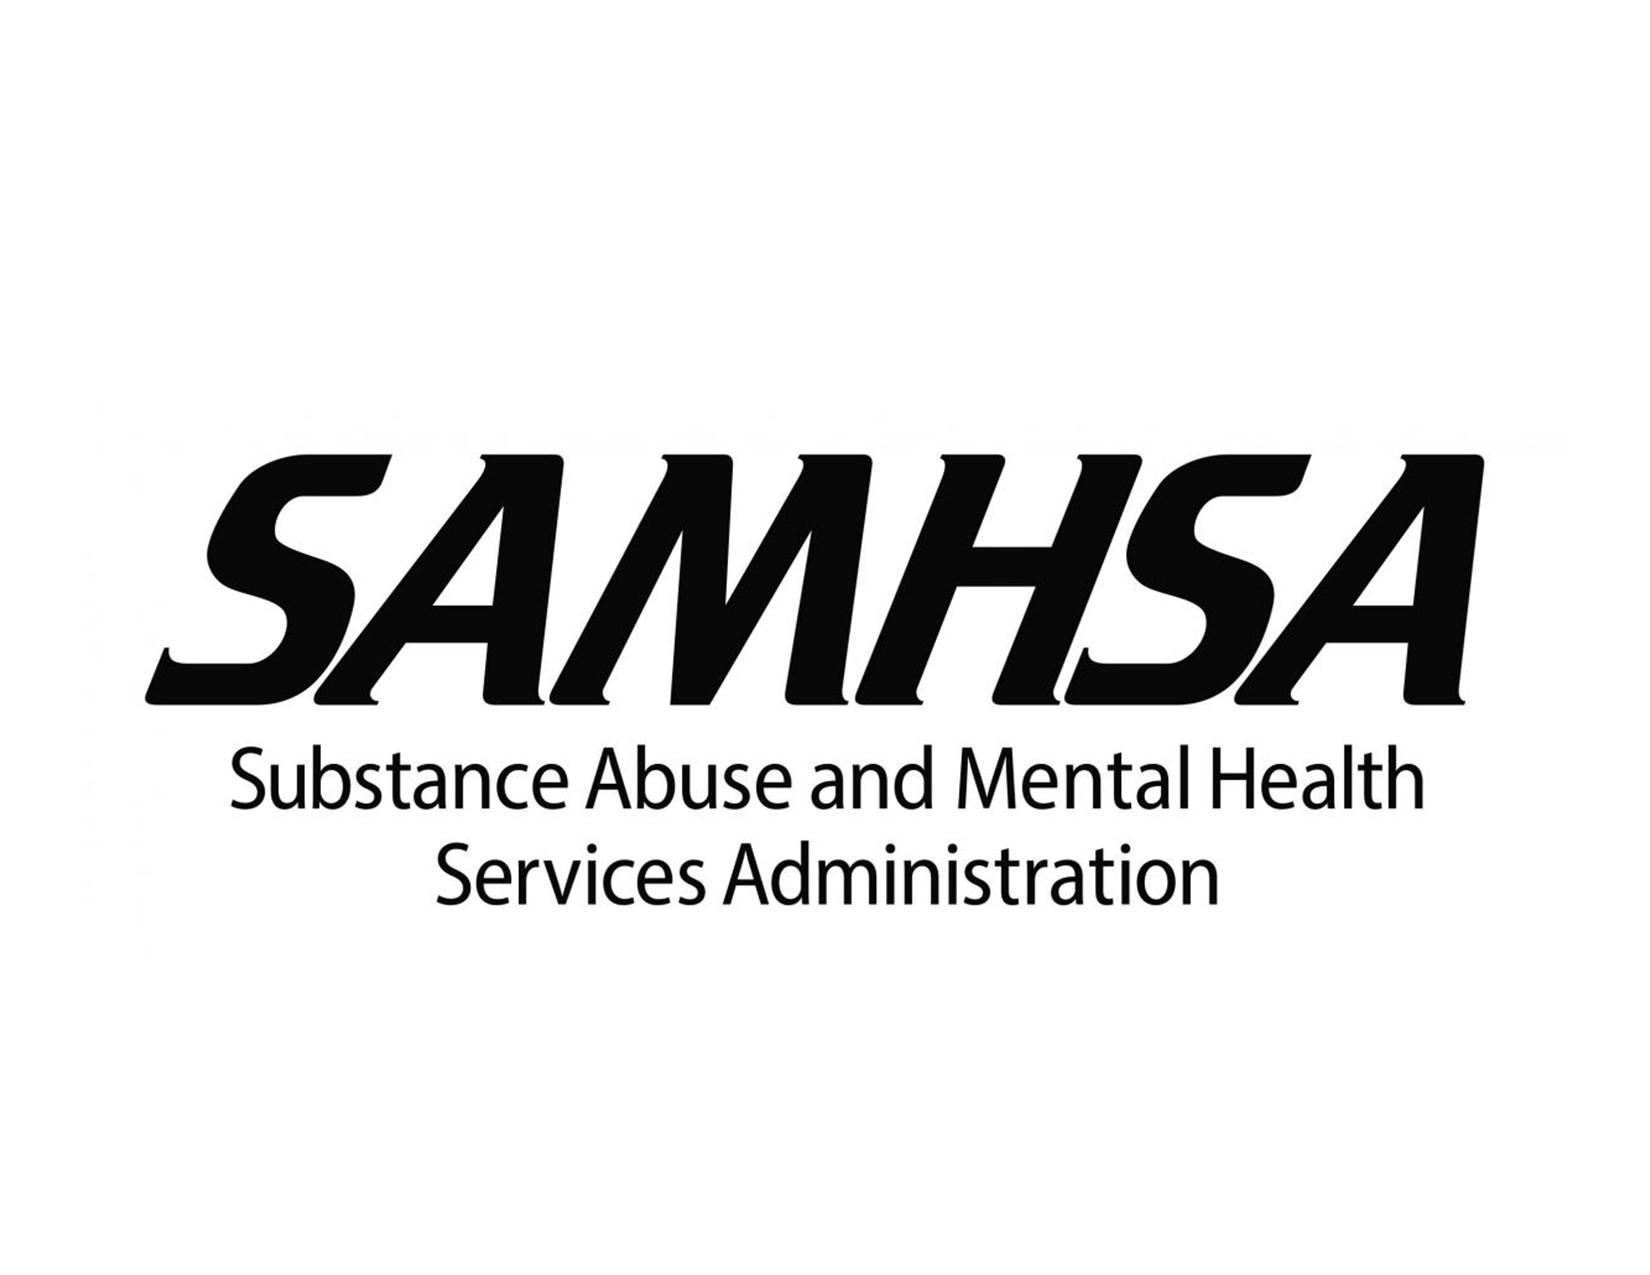 SAMHSA 1.jpg